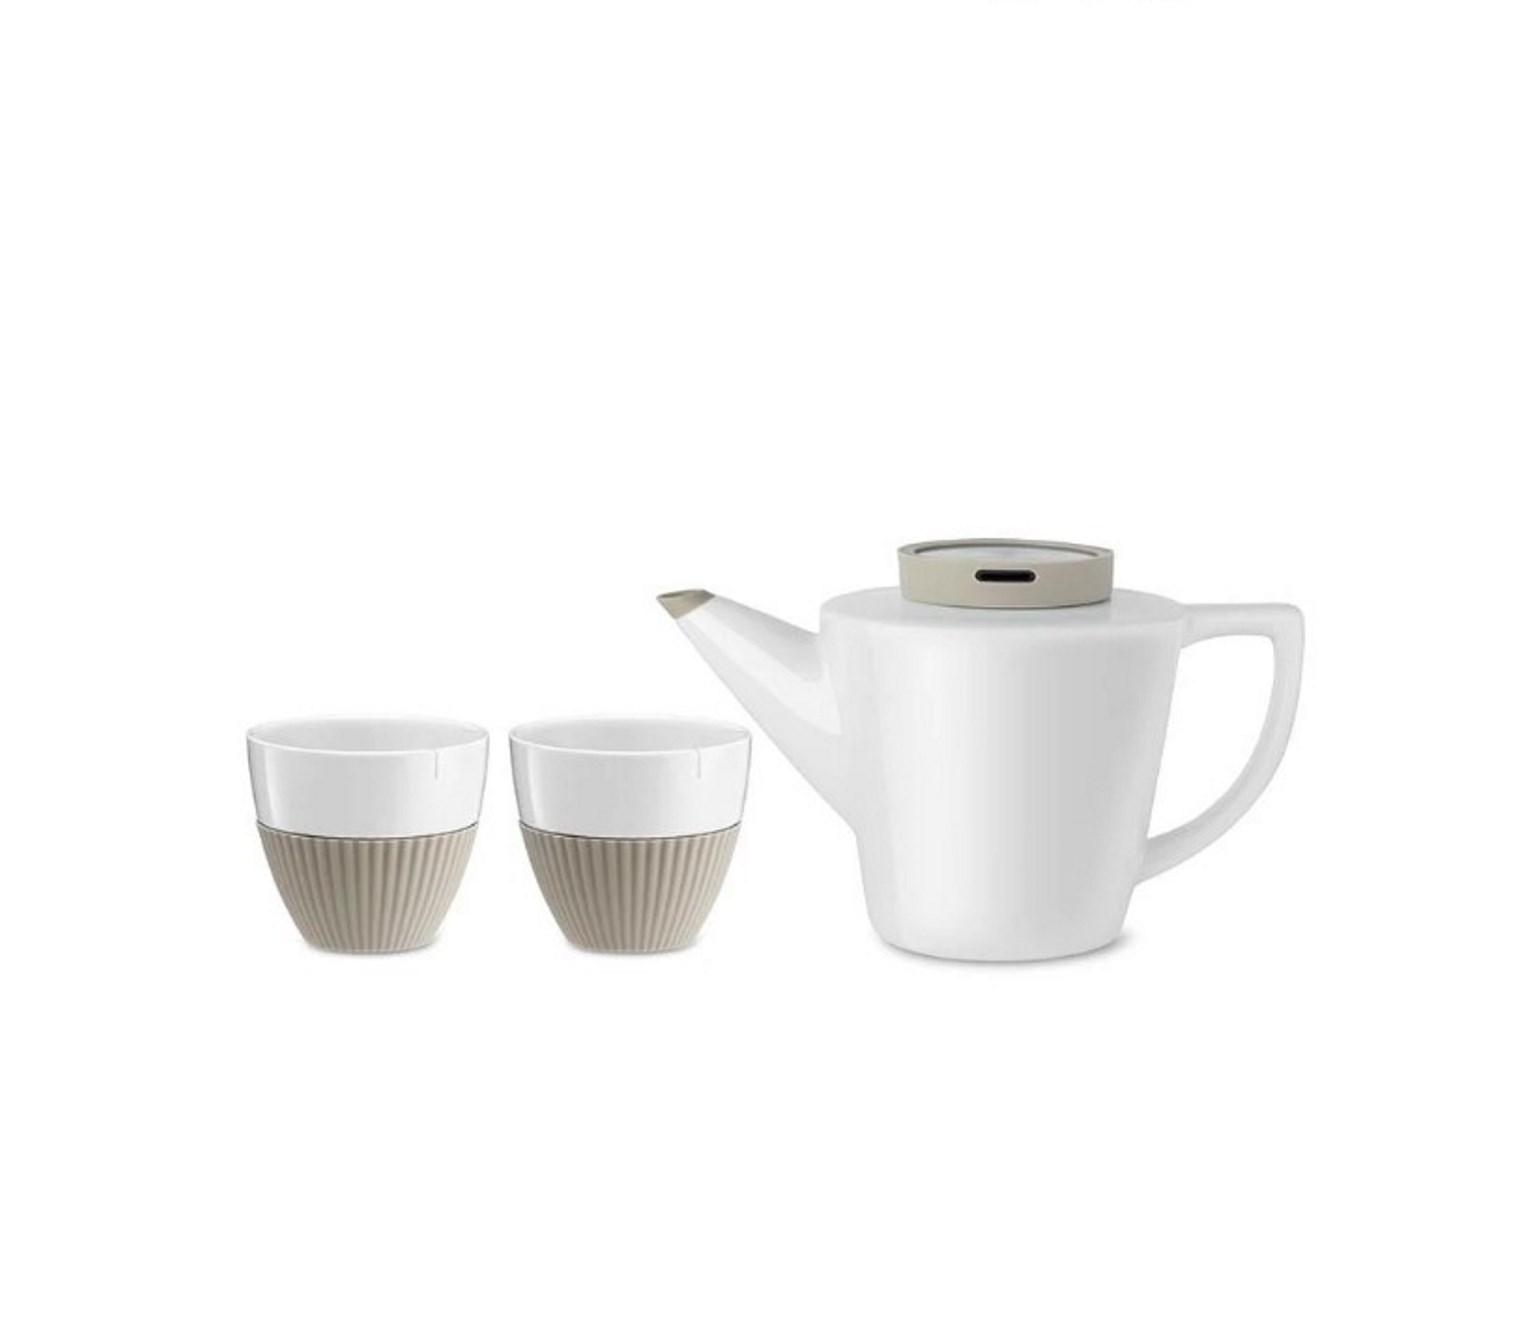 Онлайн каталог PROMENU: Чайный набор: чайник и 2 чашки Viva Scandinavia INFUSION, объем: 1 л/0,25 л, бежевый, 3 предмета Viva Scandinavia V24121